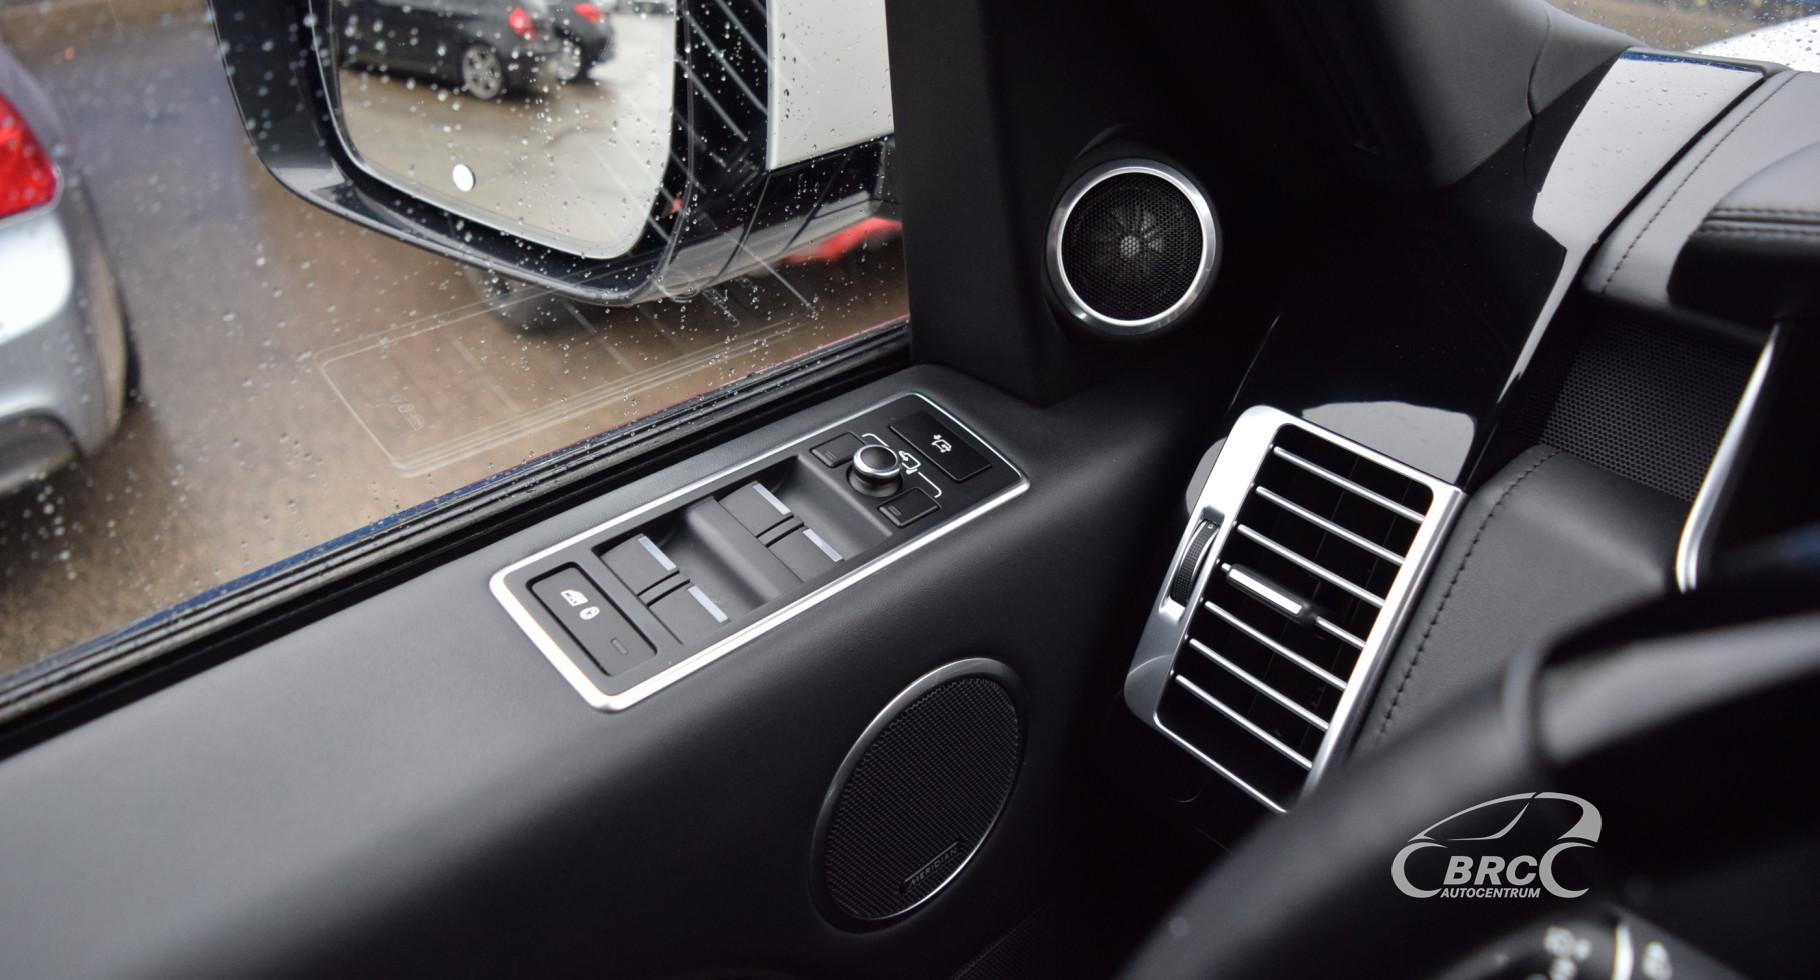 Land-Rover Range Rover Autobiography